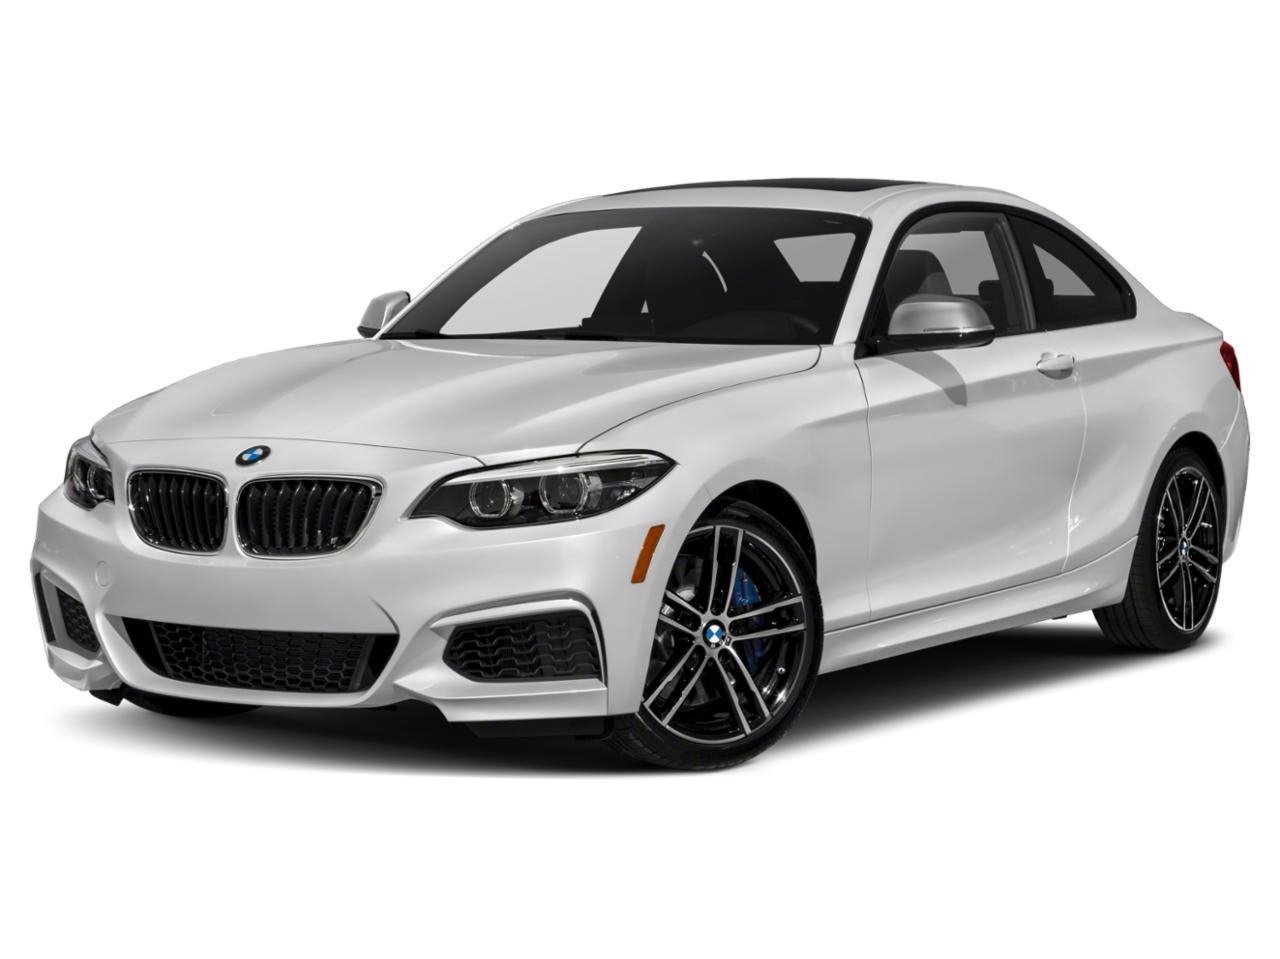 2018 BMW M240i Vehicle Photo in Pleasanton, CA 94588